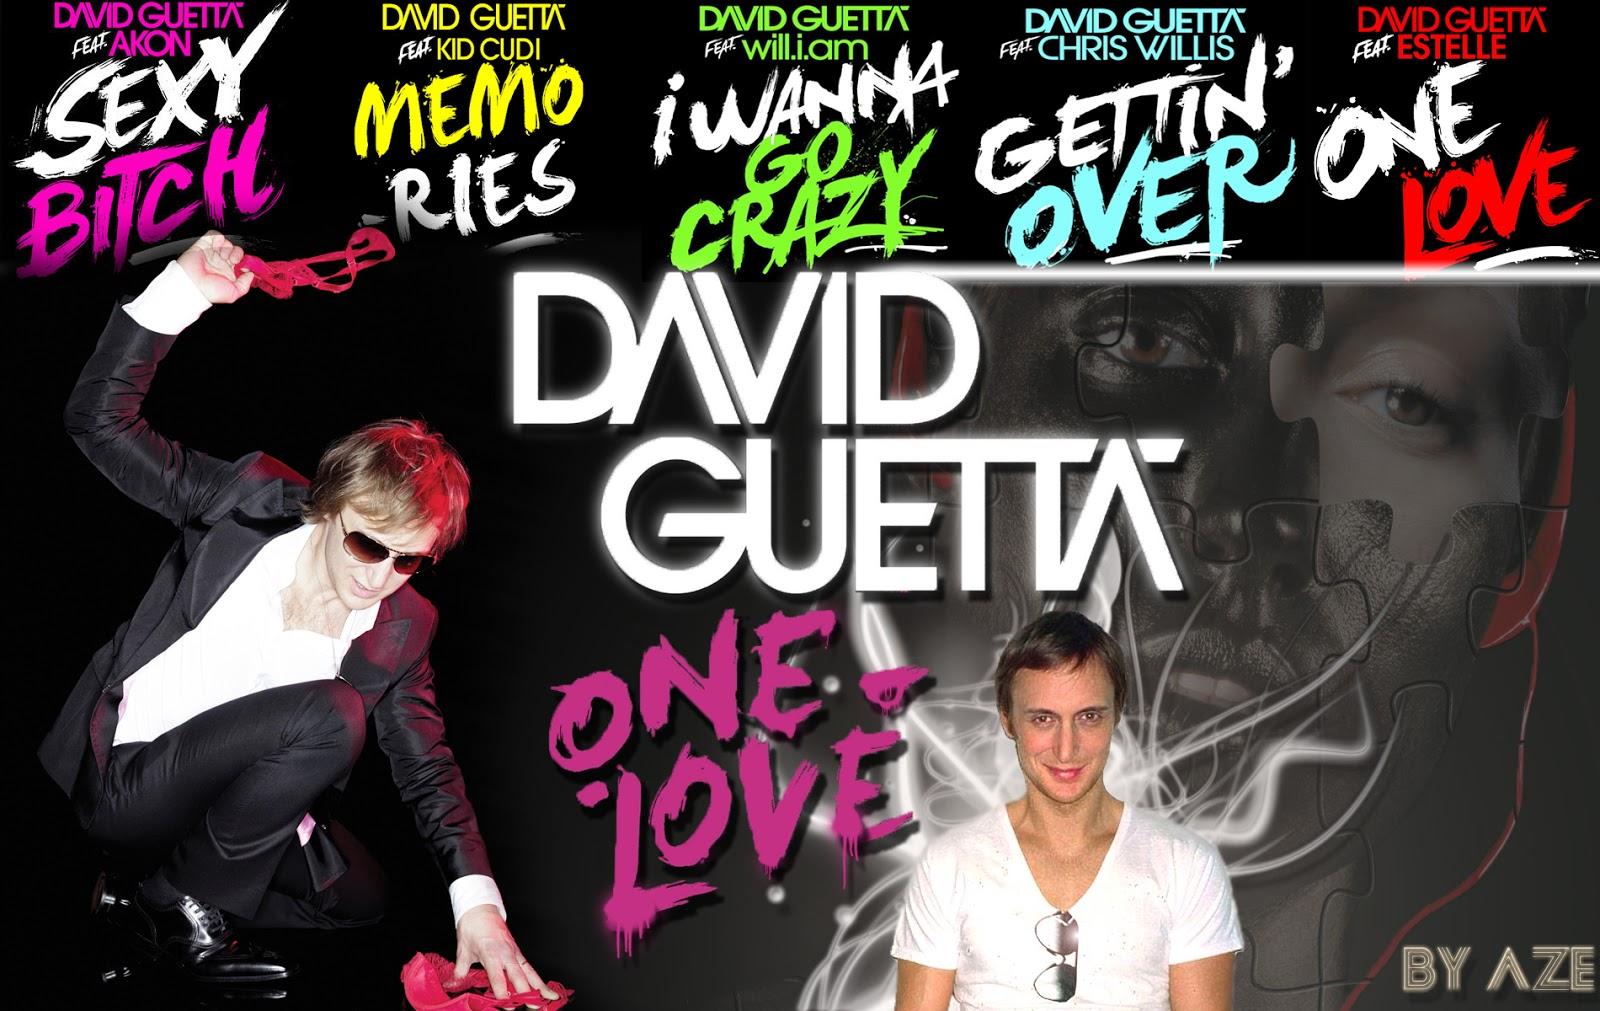 David guetta song one love